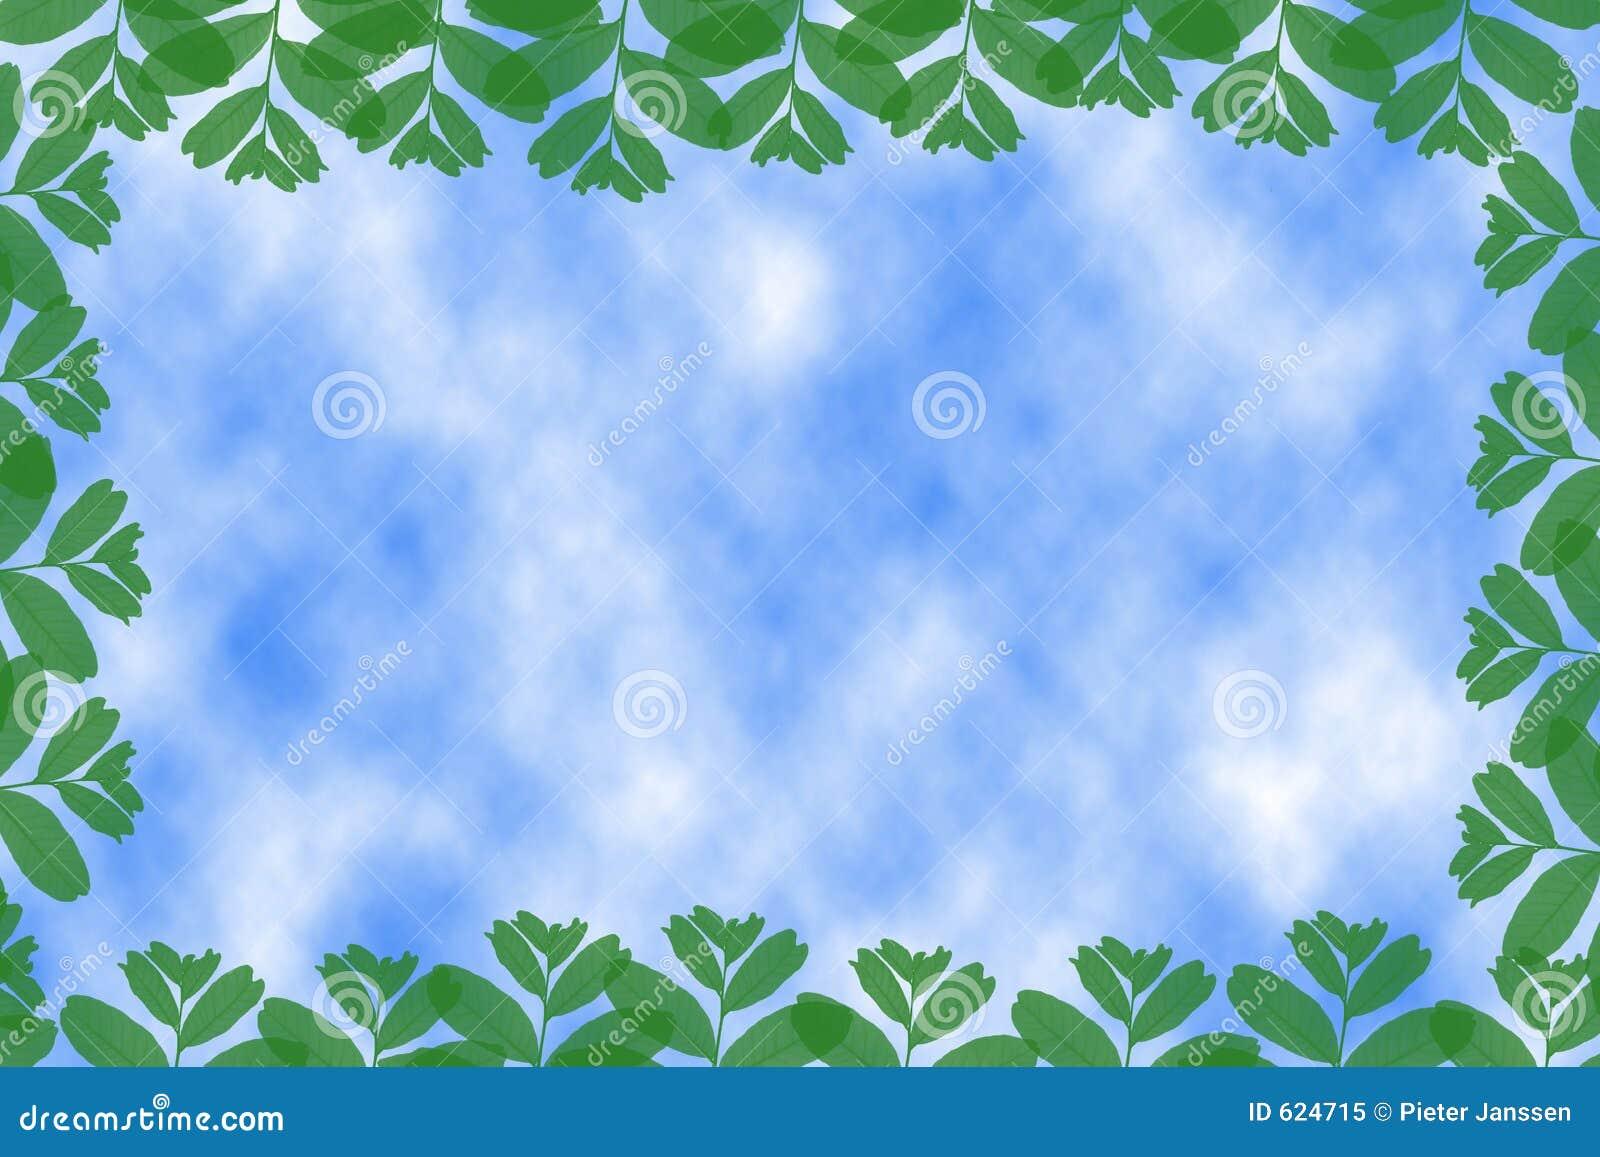 Frame van bladeren